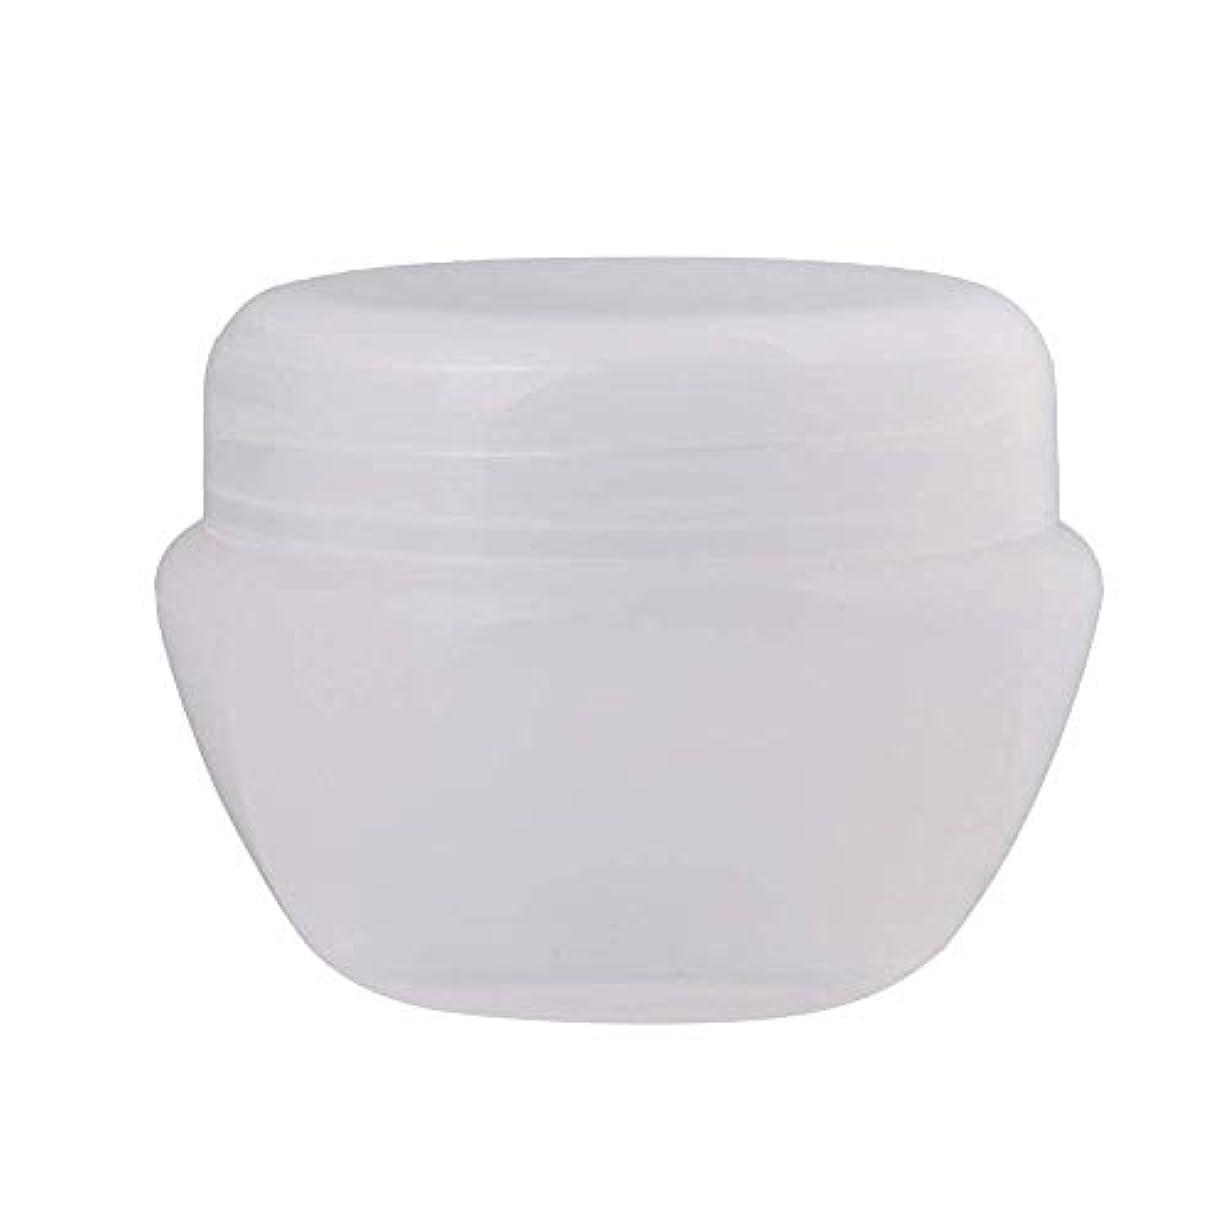 Diystyle 20個入 5g クリームケース 空ポット 化粧品用 詰替え 空容器 旅行用品 ホワイト